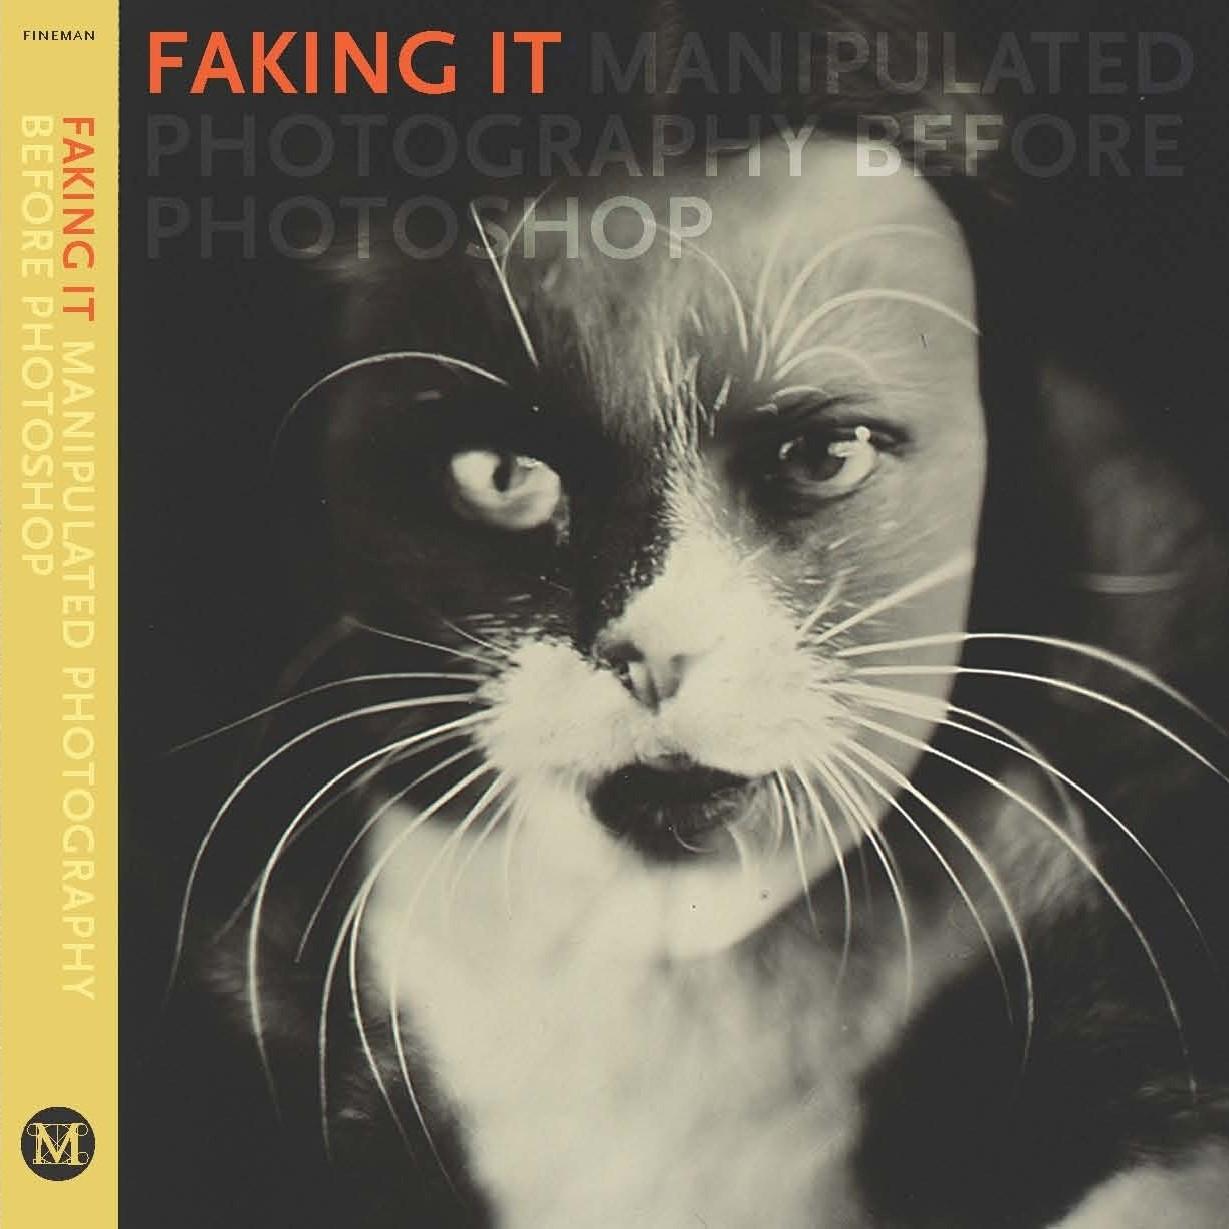 Faking It (exhibition catalogue)